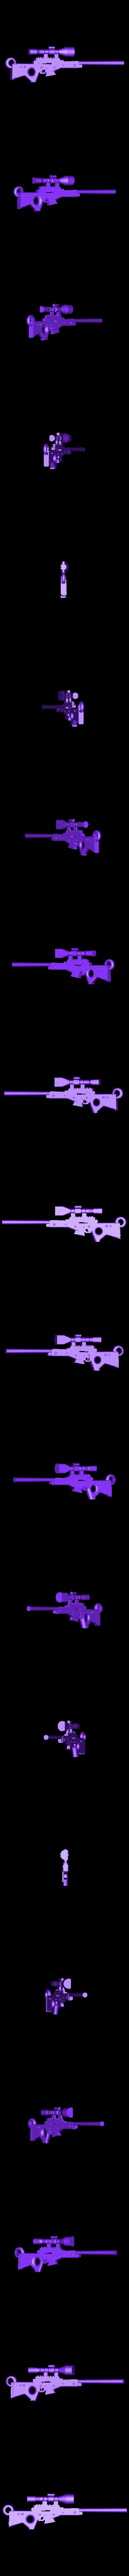 Sniper fortnite 3.stl Download free STL file Fortnite Sniper Key Chain • Model to 3D print, davidbt96